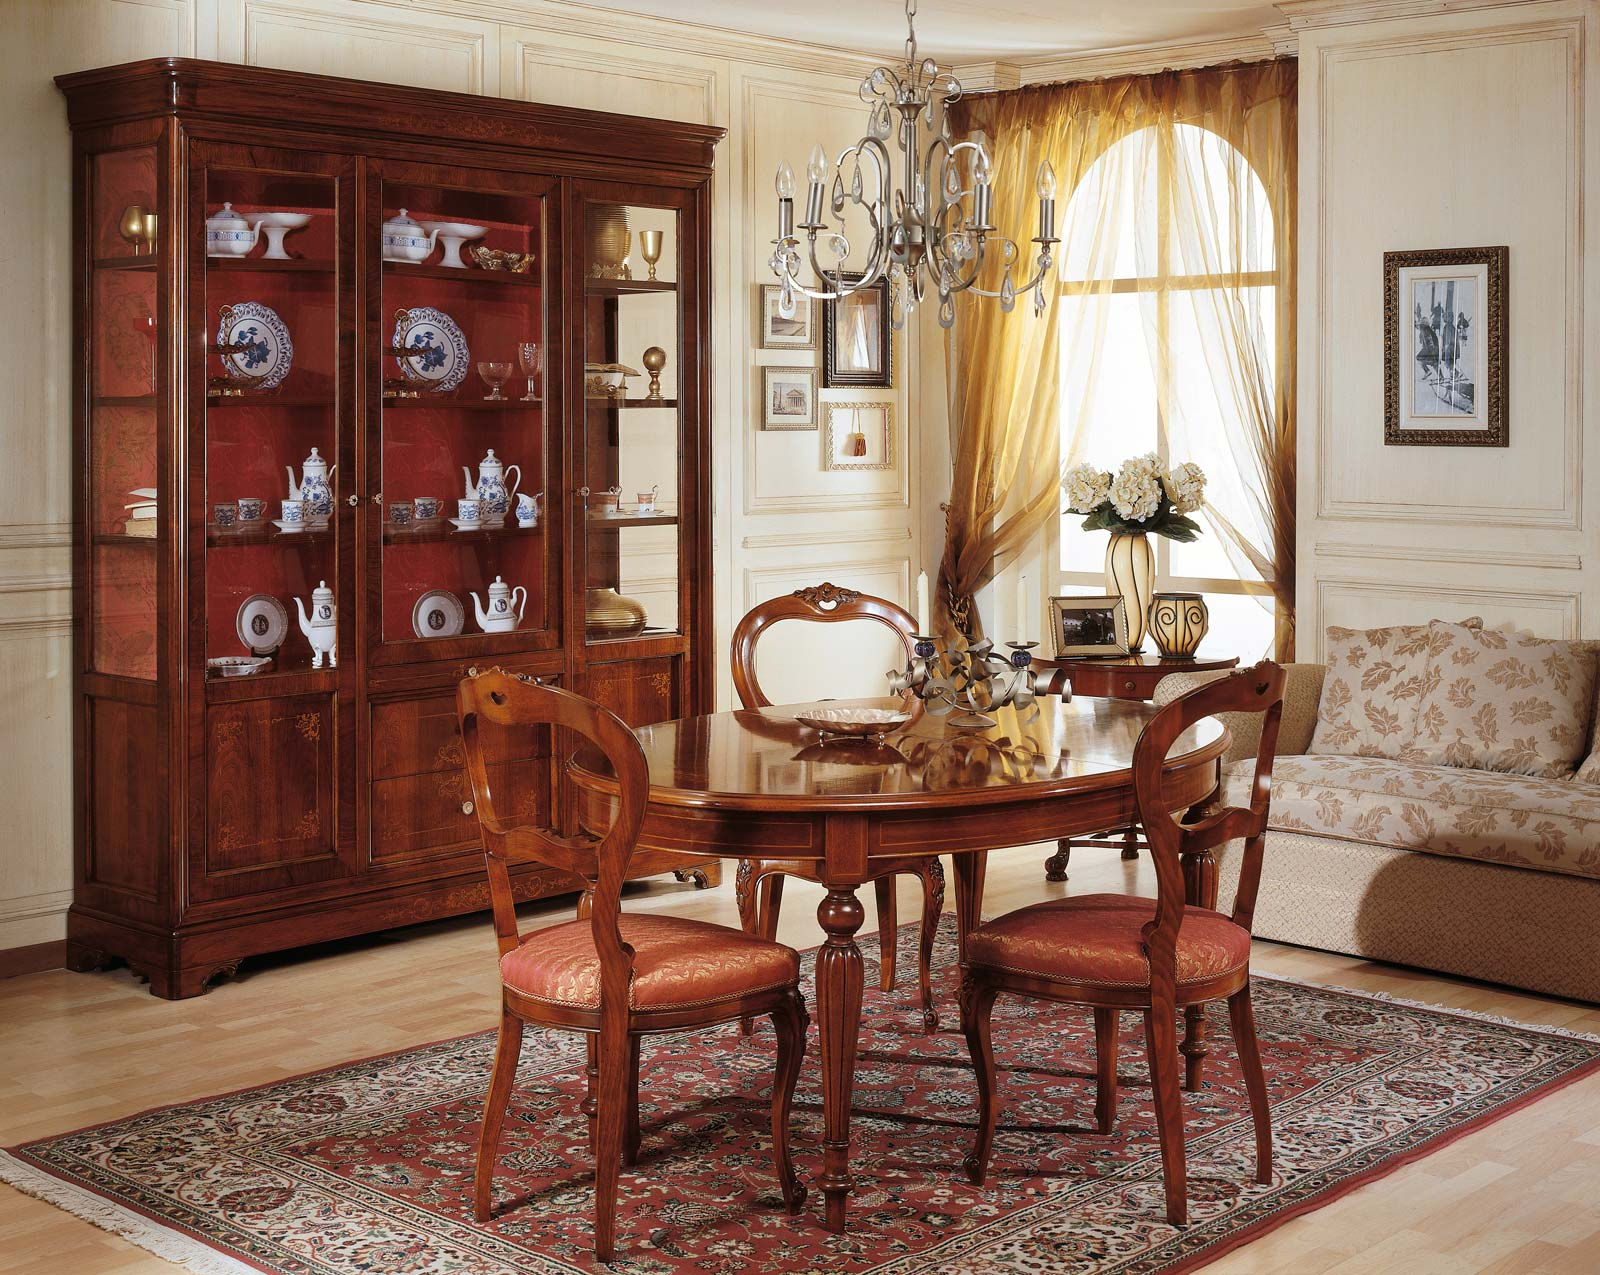 Sala Da Pranzo 800 Francese Tavolo E Vetrina Vimercati Meda #401E16 1600 1275 Sala Da Pranzo Classica Ikea